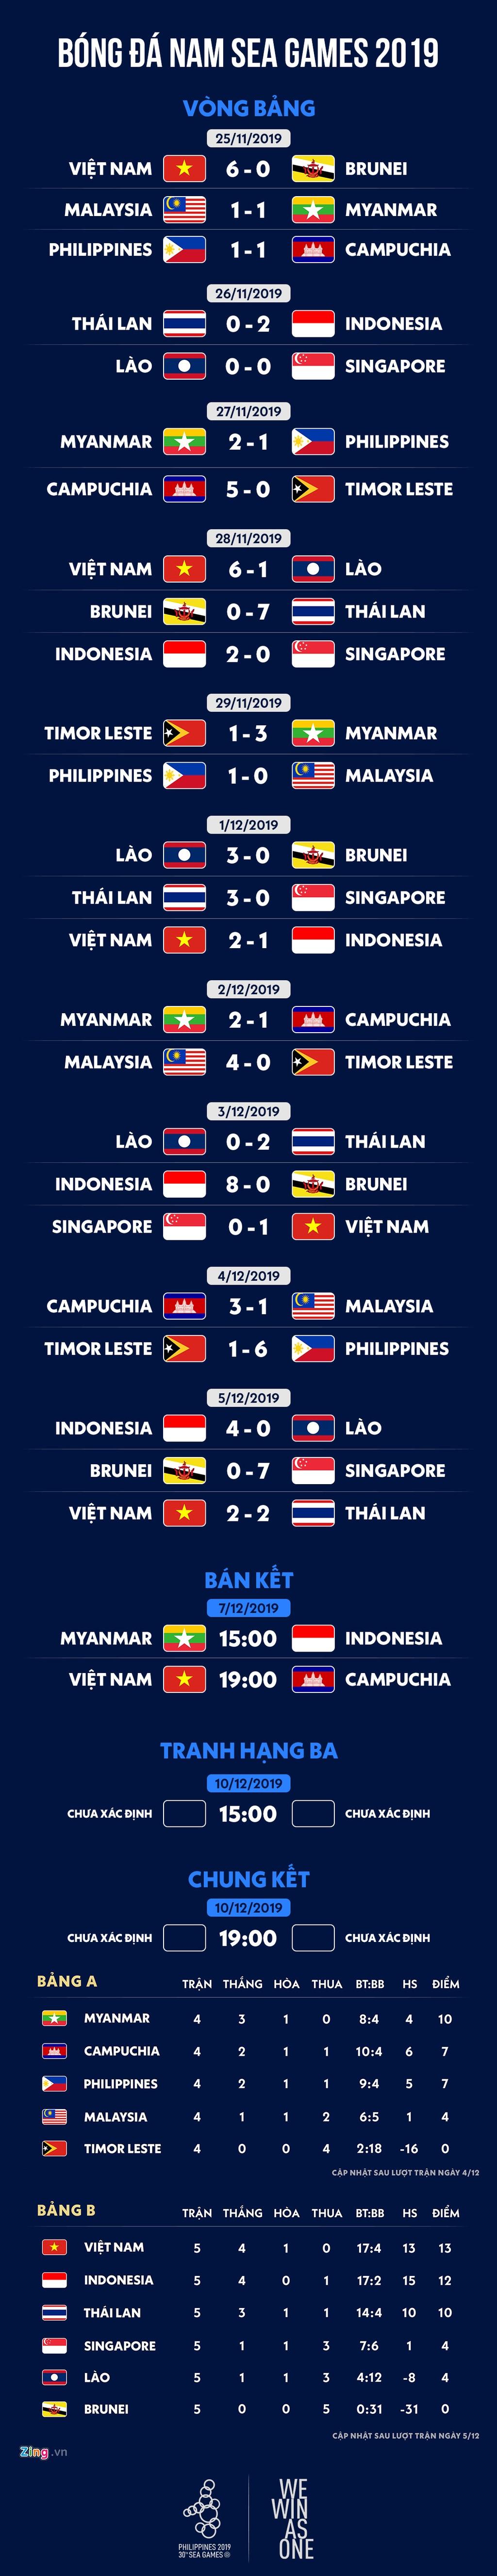 Ket qua bong da nam SEA Games 30: Viet Nam gap Campuchia o ban ket hinh anh 1